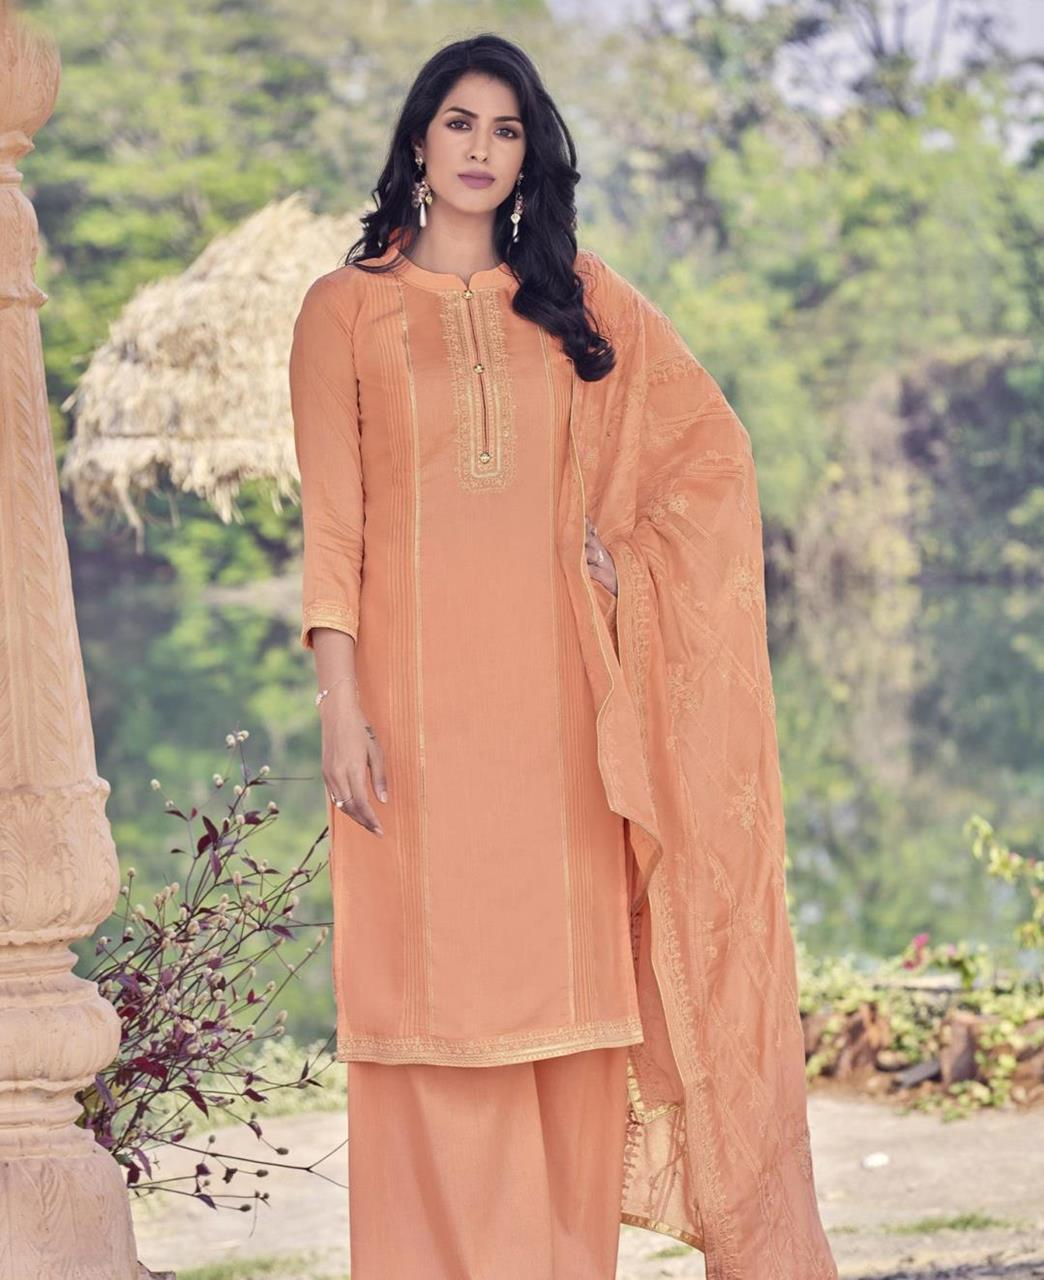 Zari Cotton Straight cut Salwar Kameez in Light Orange